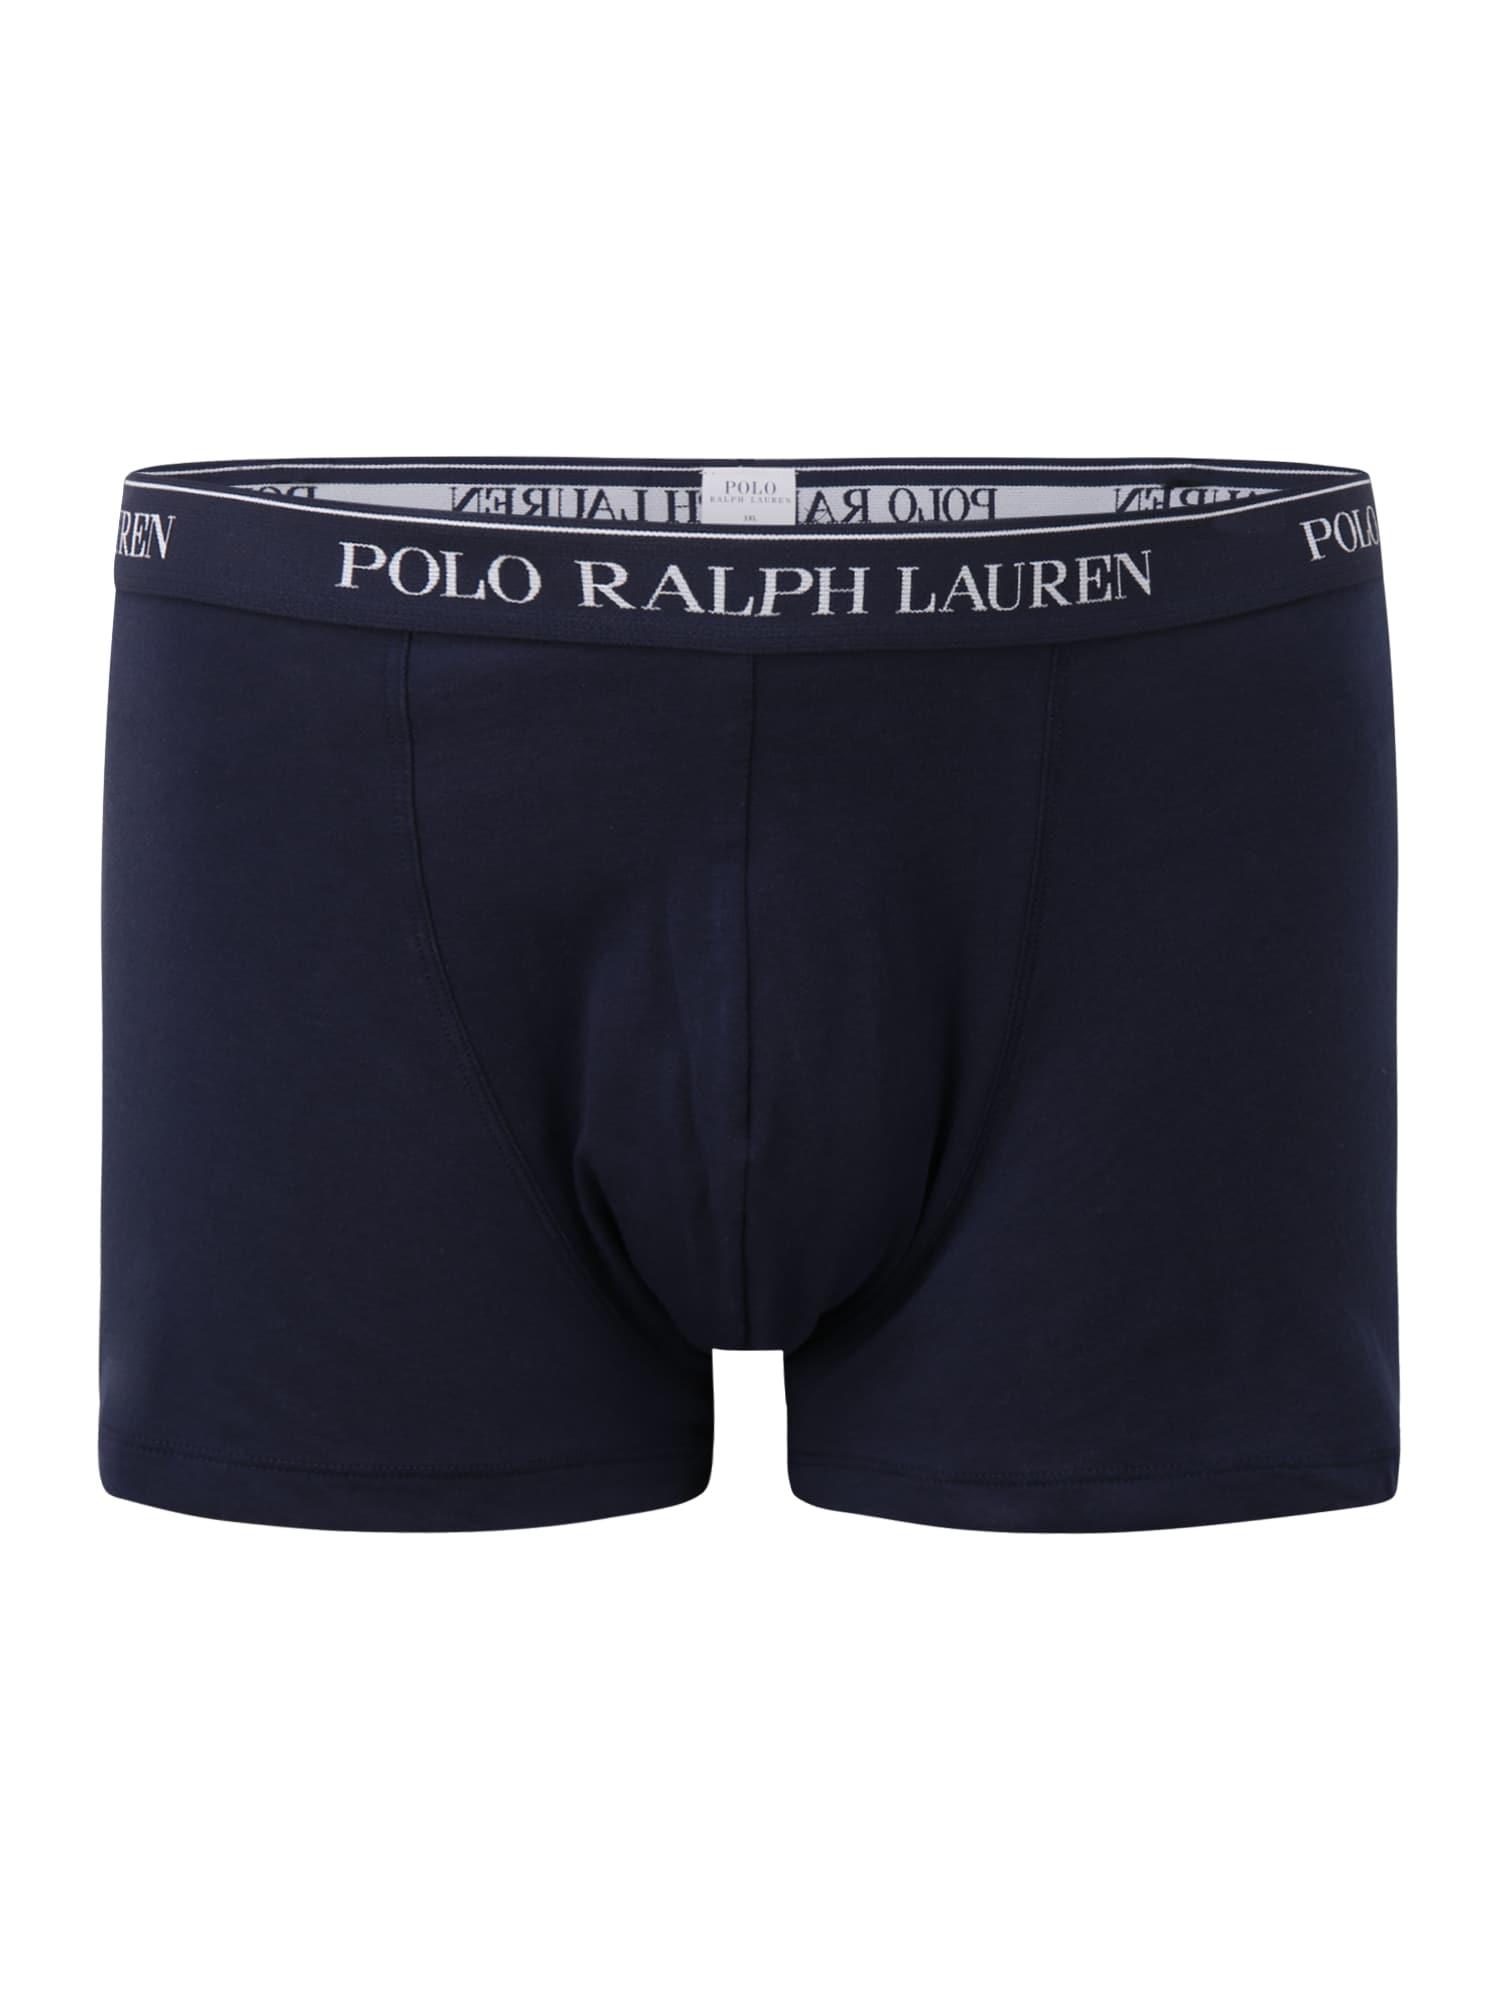 POLO RALPH LAUREN Boxer trumpikės tamsiai mėlyna